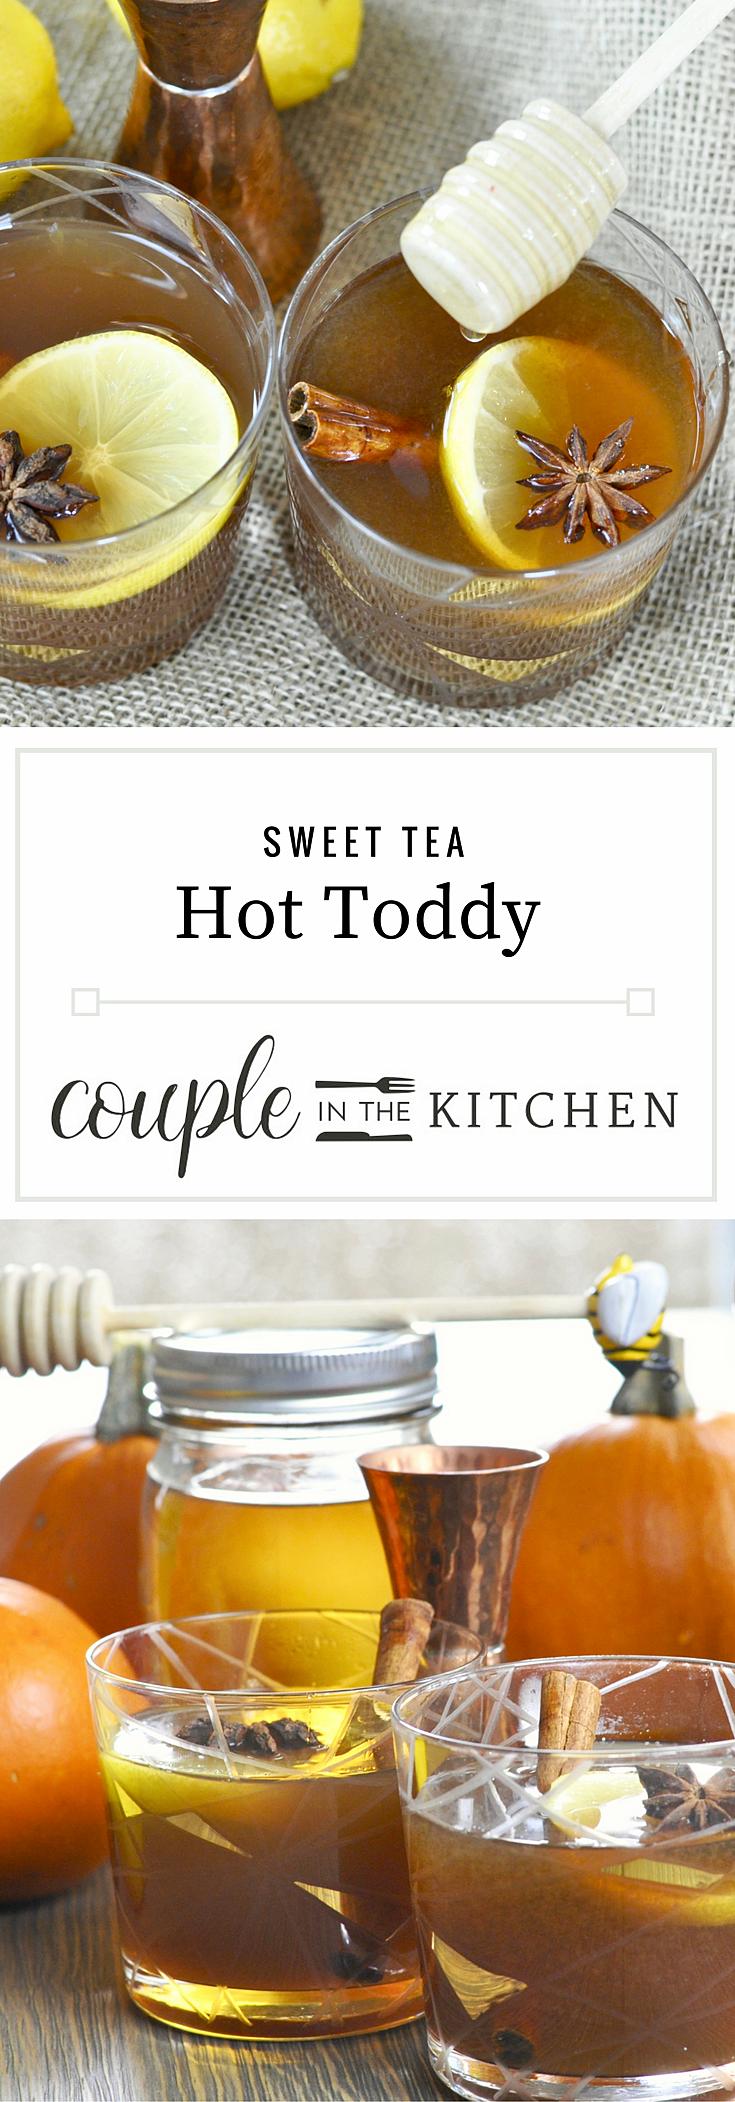 Hot Toddy Recipe | coupleinthekitchen.com